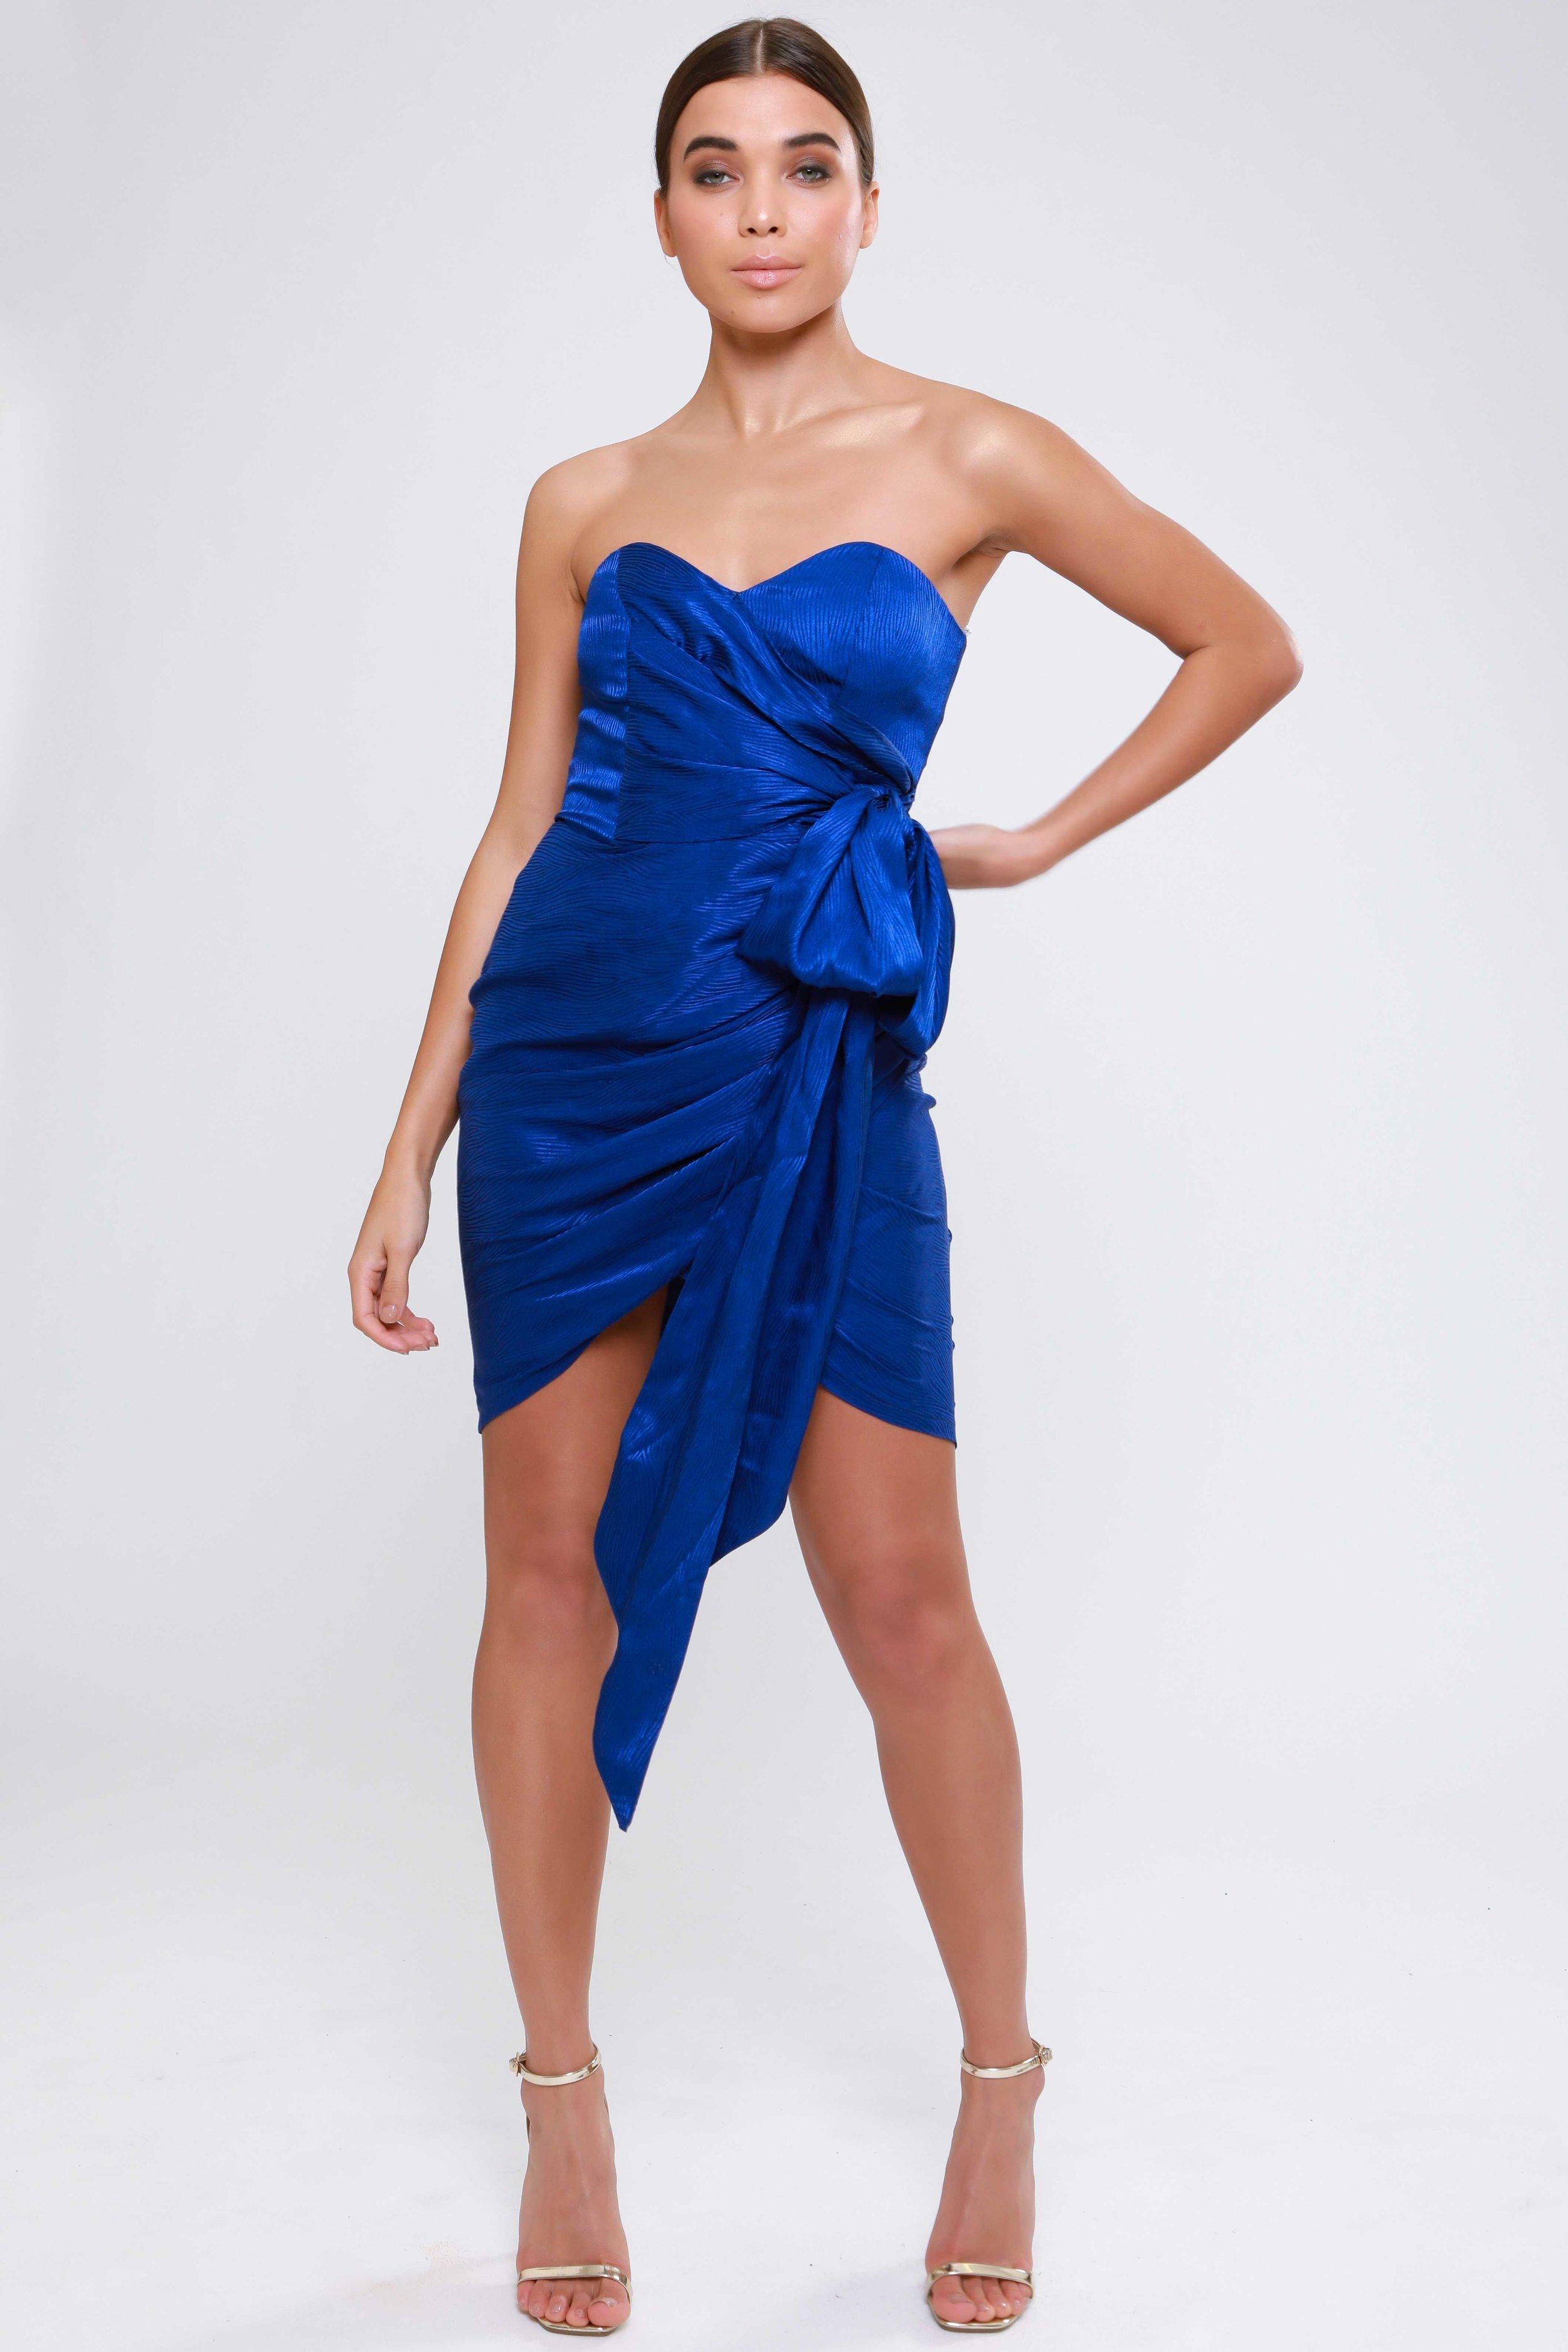 Satin Wrap Dress With  Statement Tie Detail   £56.00